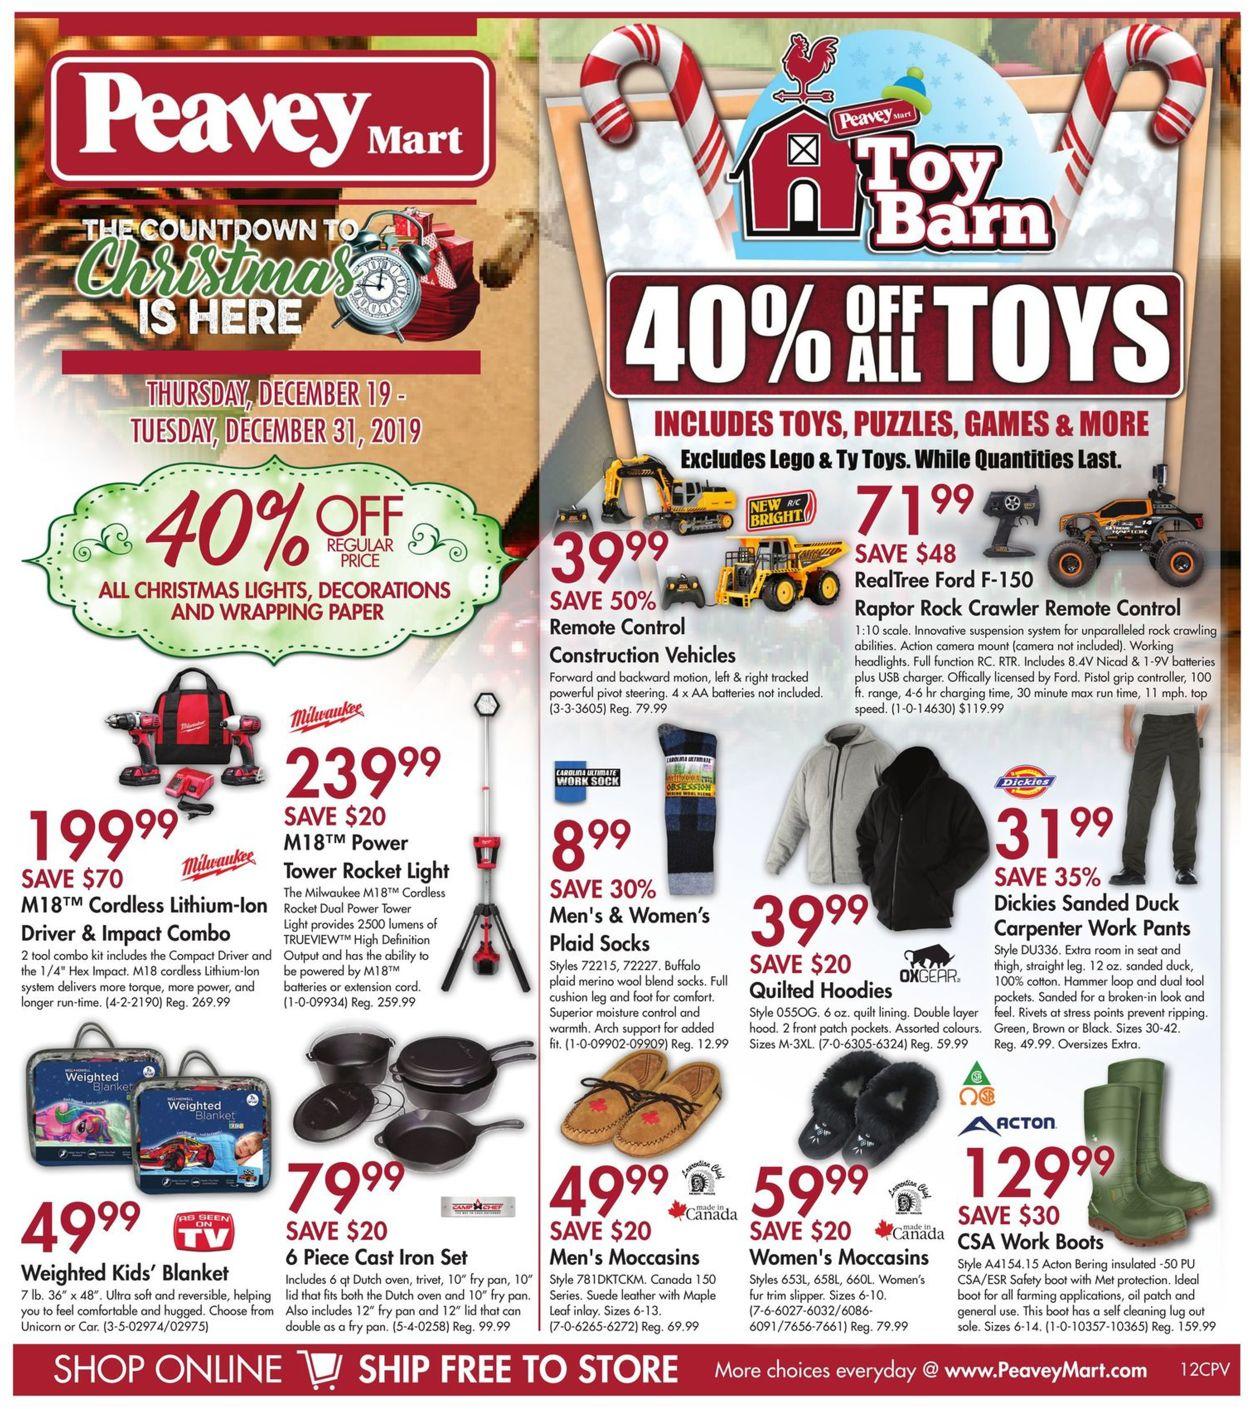 Peavey Mart Christmas Flyer 2019